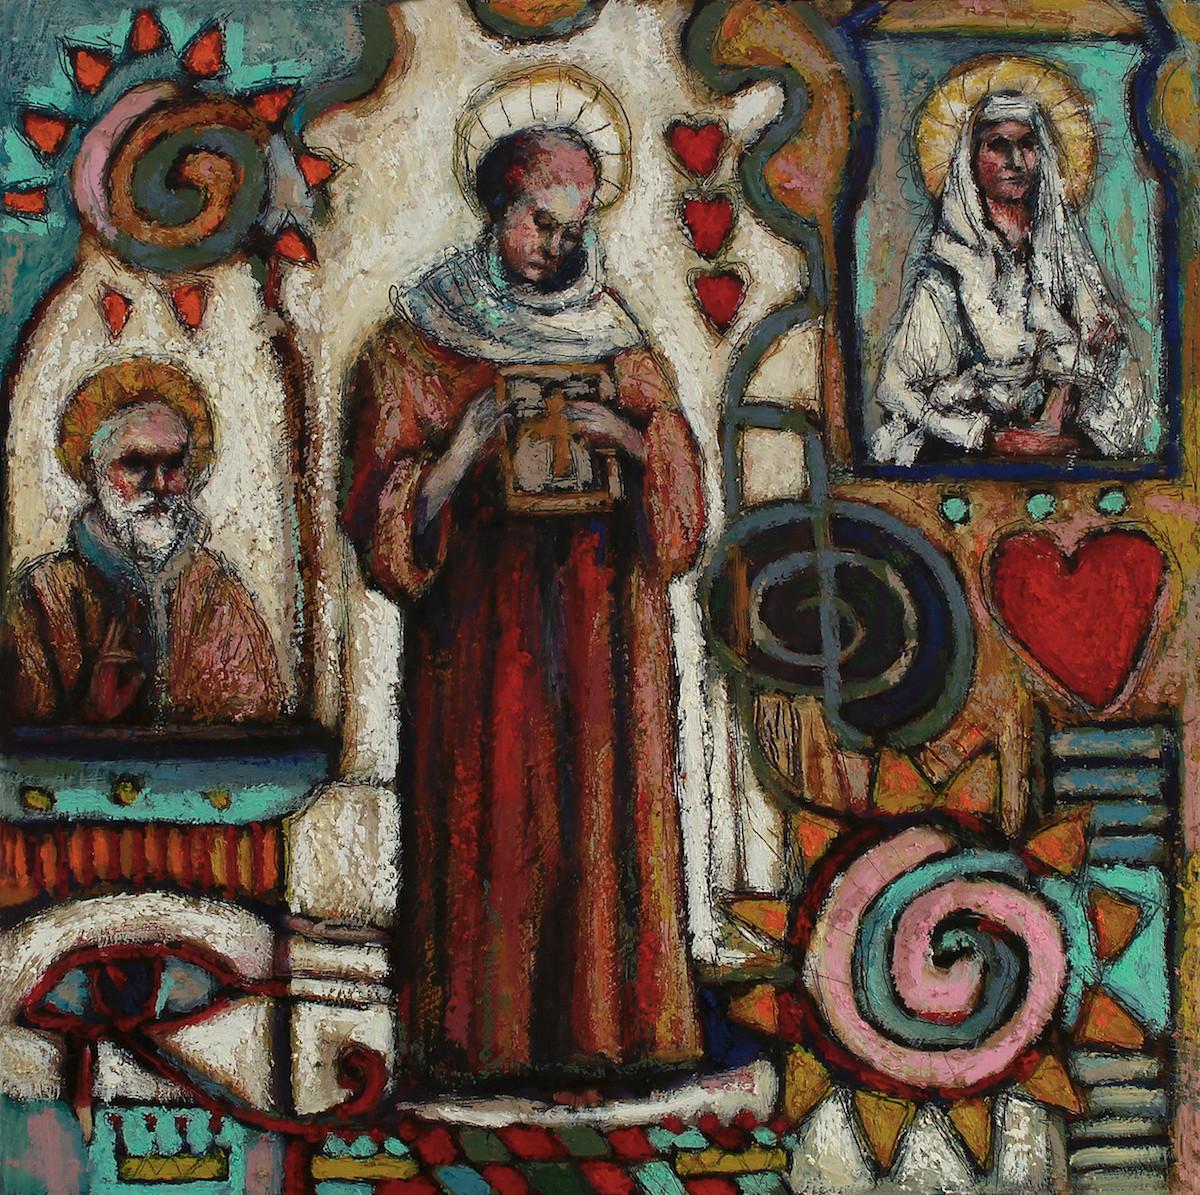 Saints & Symbols